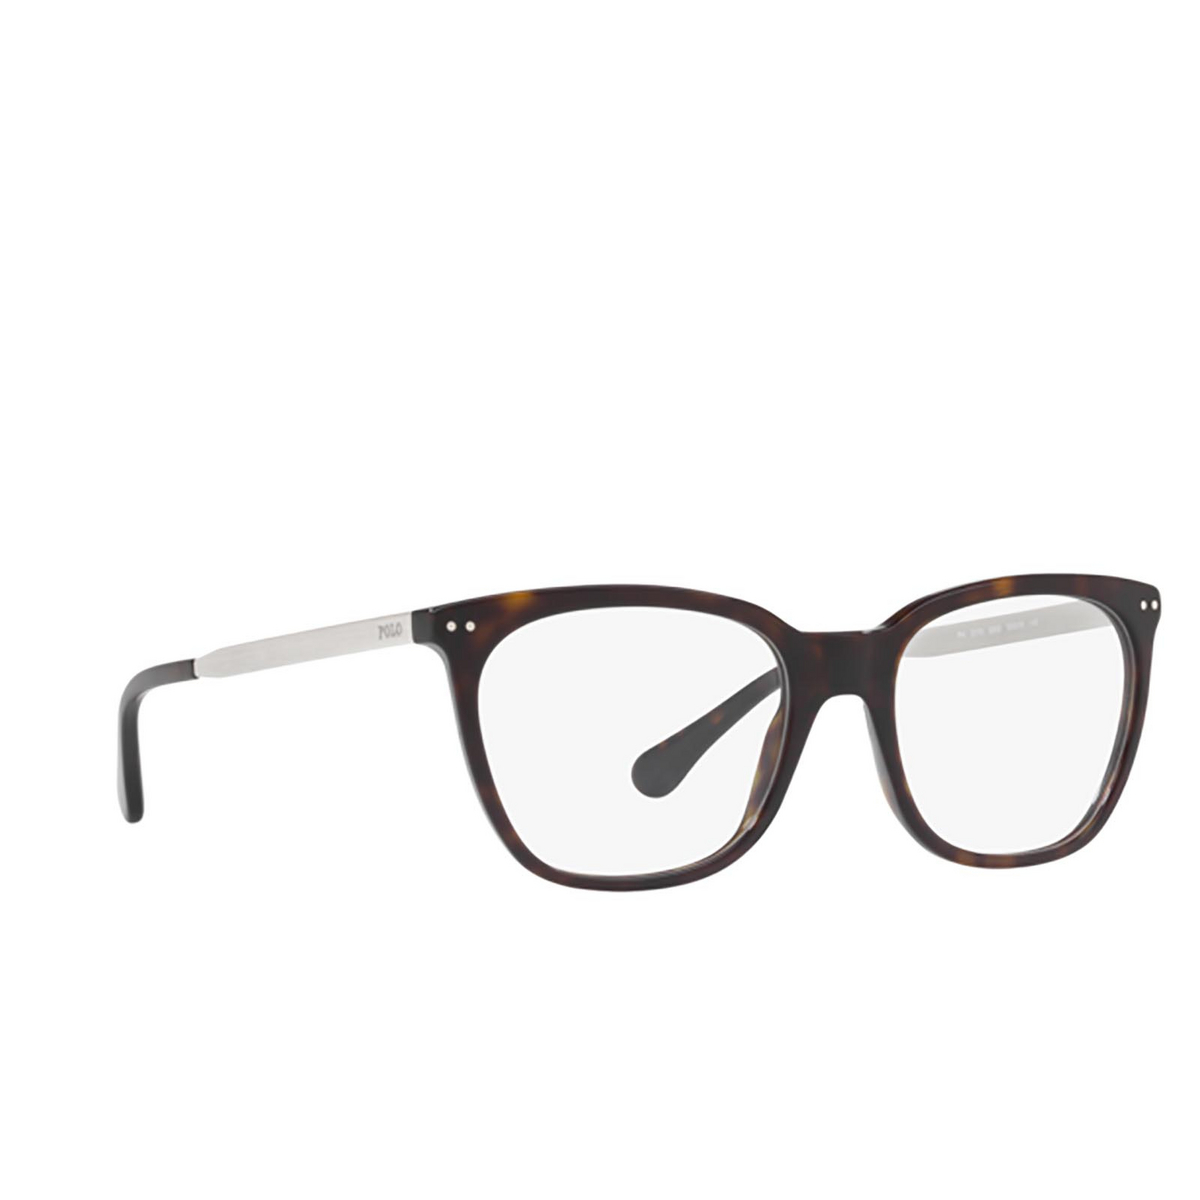 Polo Ralph Lauren® Square Eyeglasses: PH2170 color 5003.